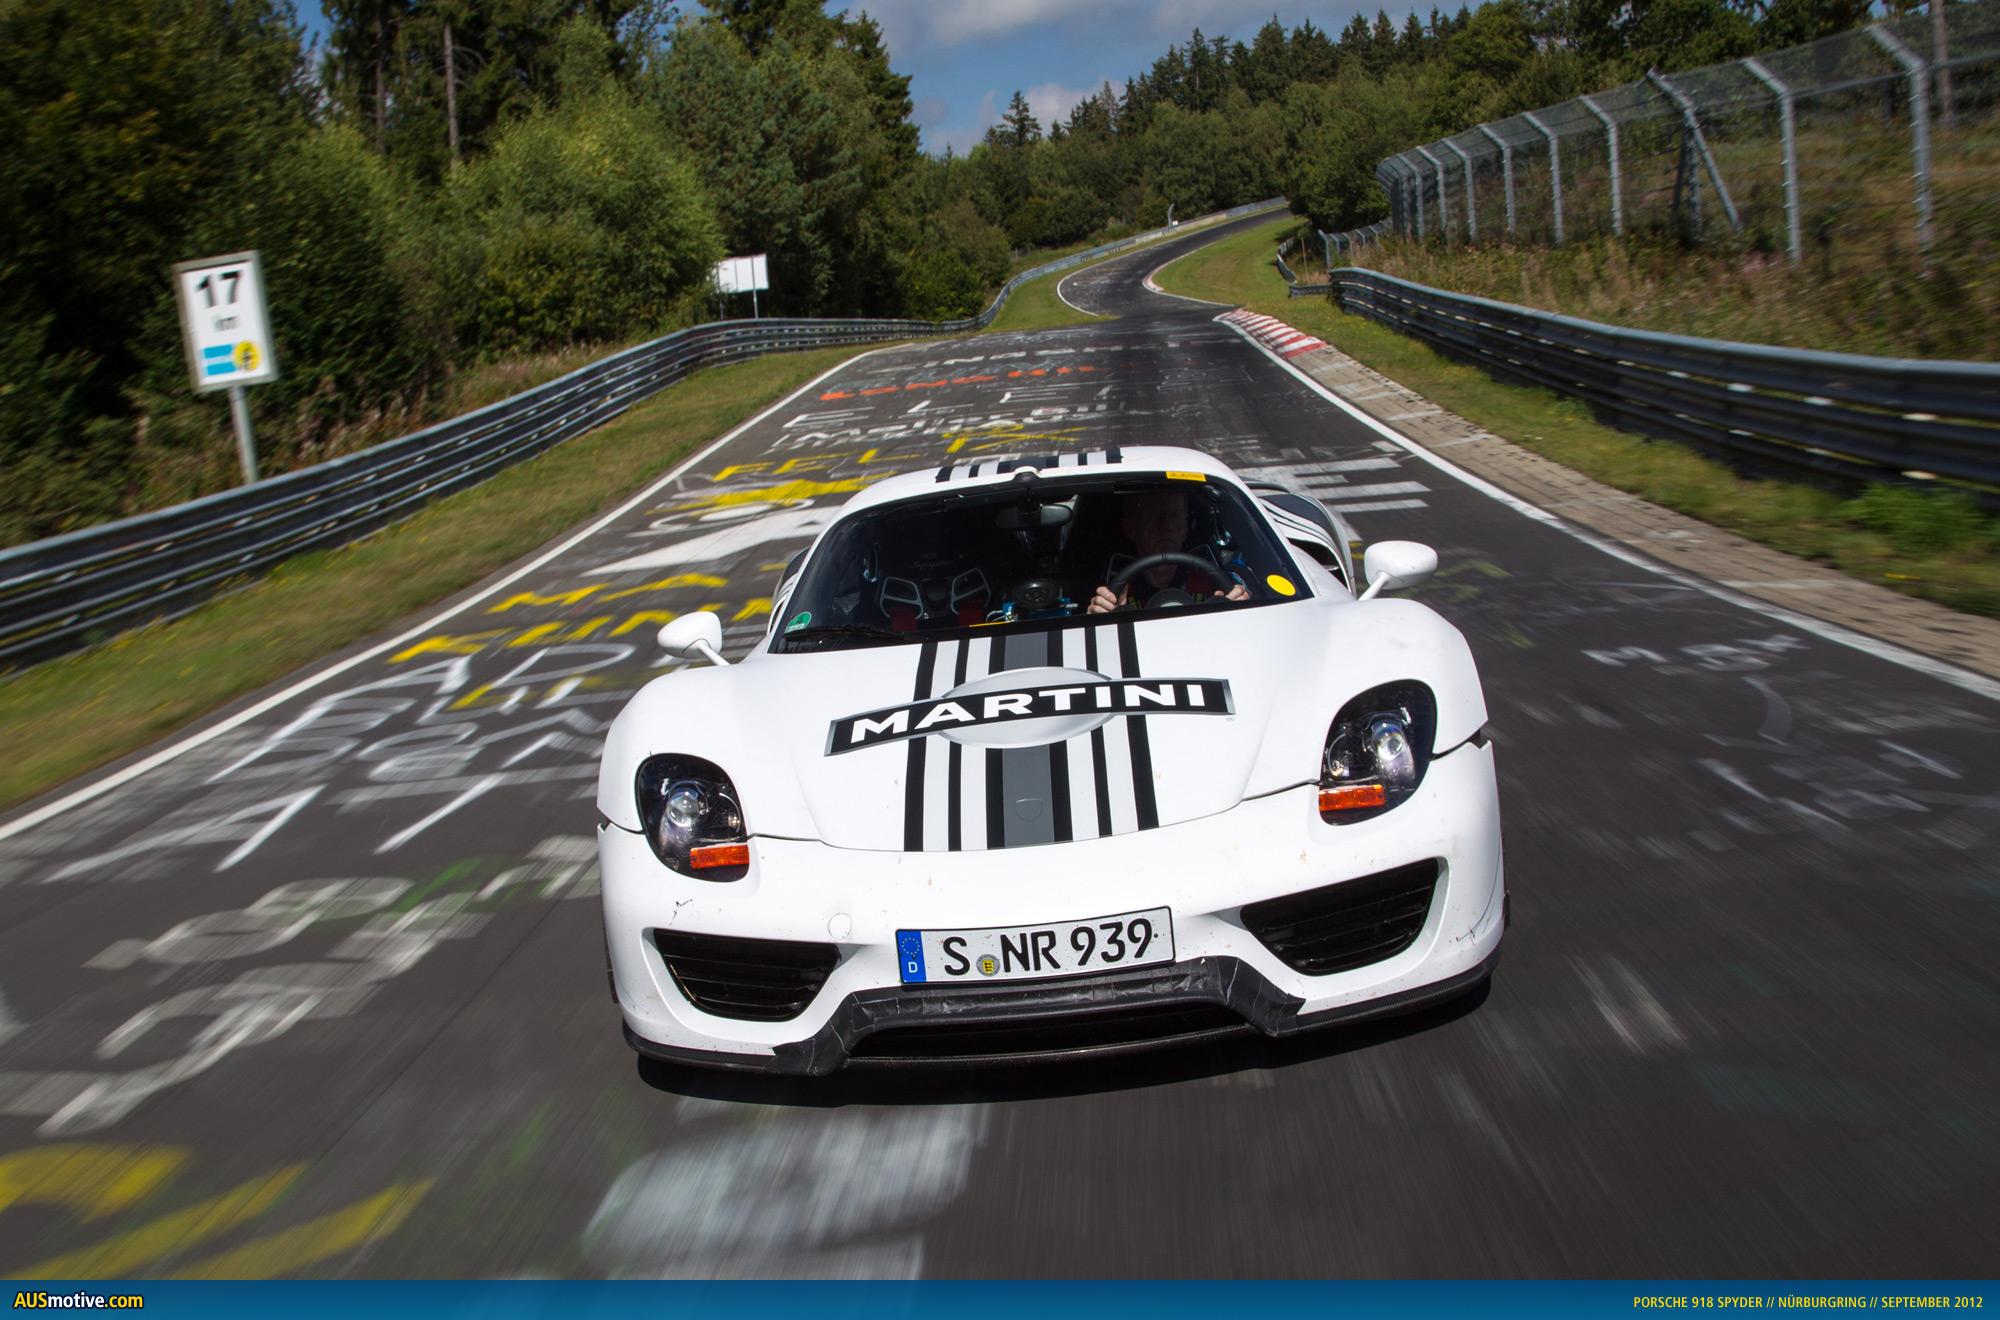 2012 porsche 918 spyder prototype test drives on nurburgring autos post. Black Bedroom Furniture Sets. Home Design Ideas